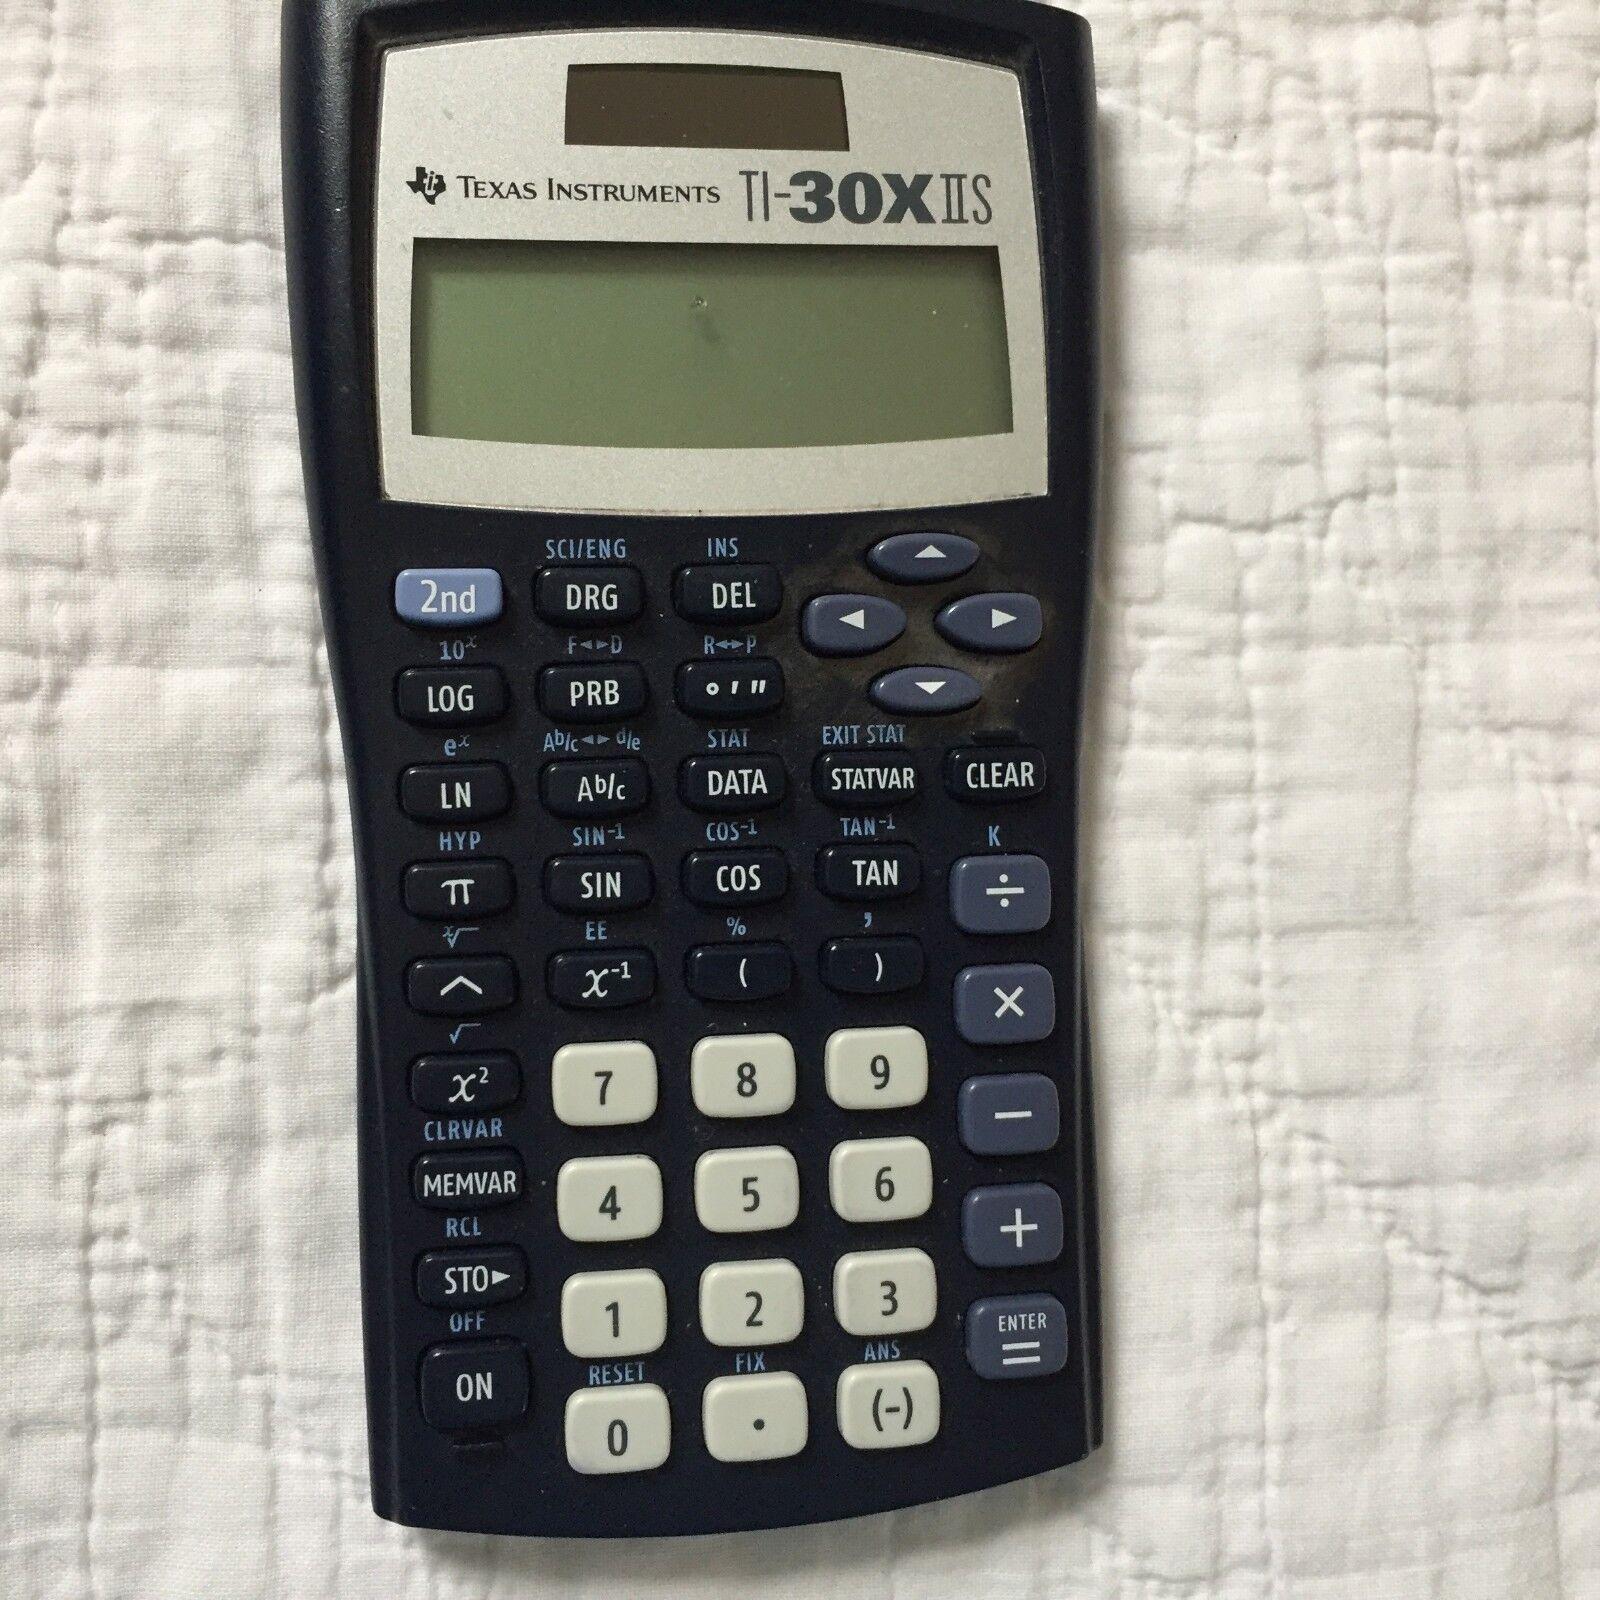 Texas Instruments Scientific Calculator  TI-30X IIS